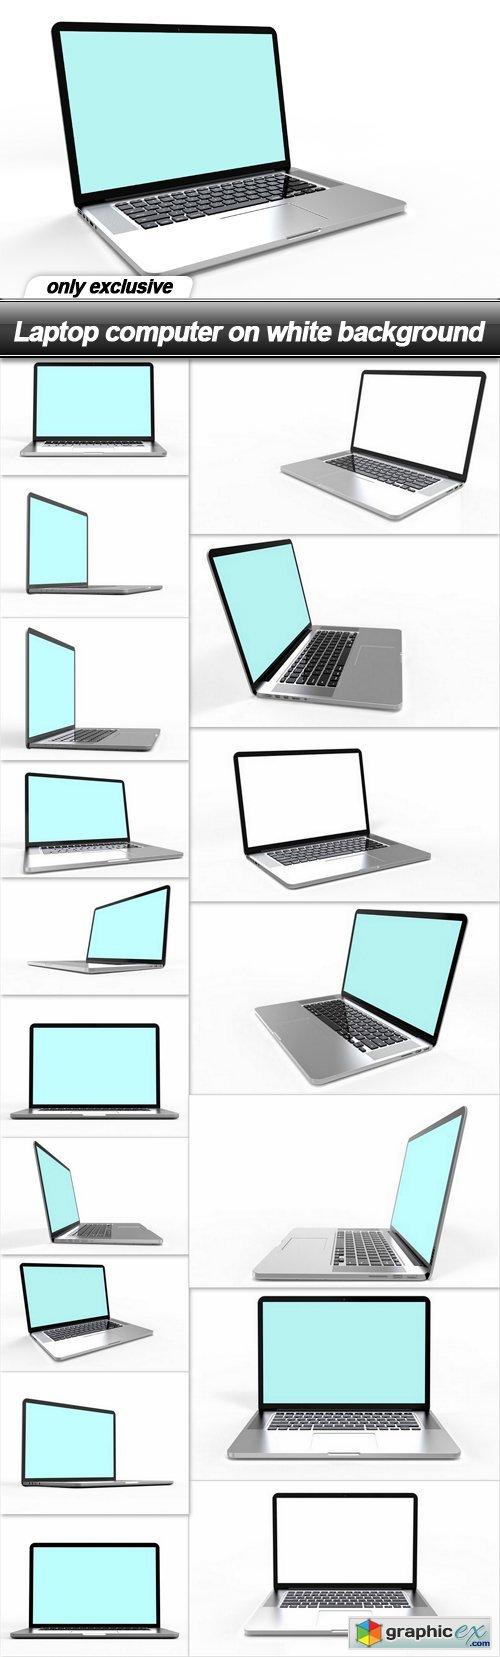 Laptop computer on white background - 17 UHQ JPEG